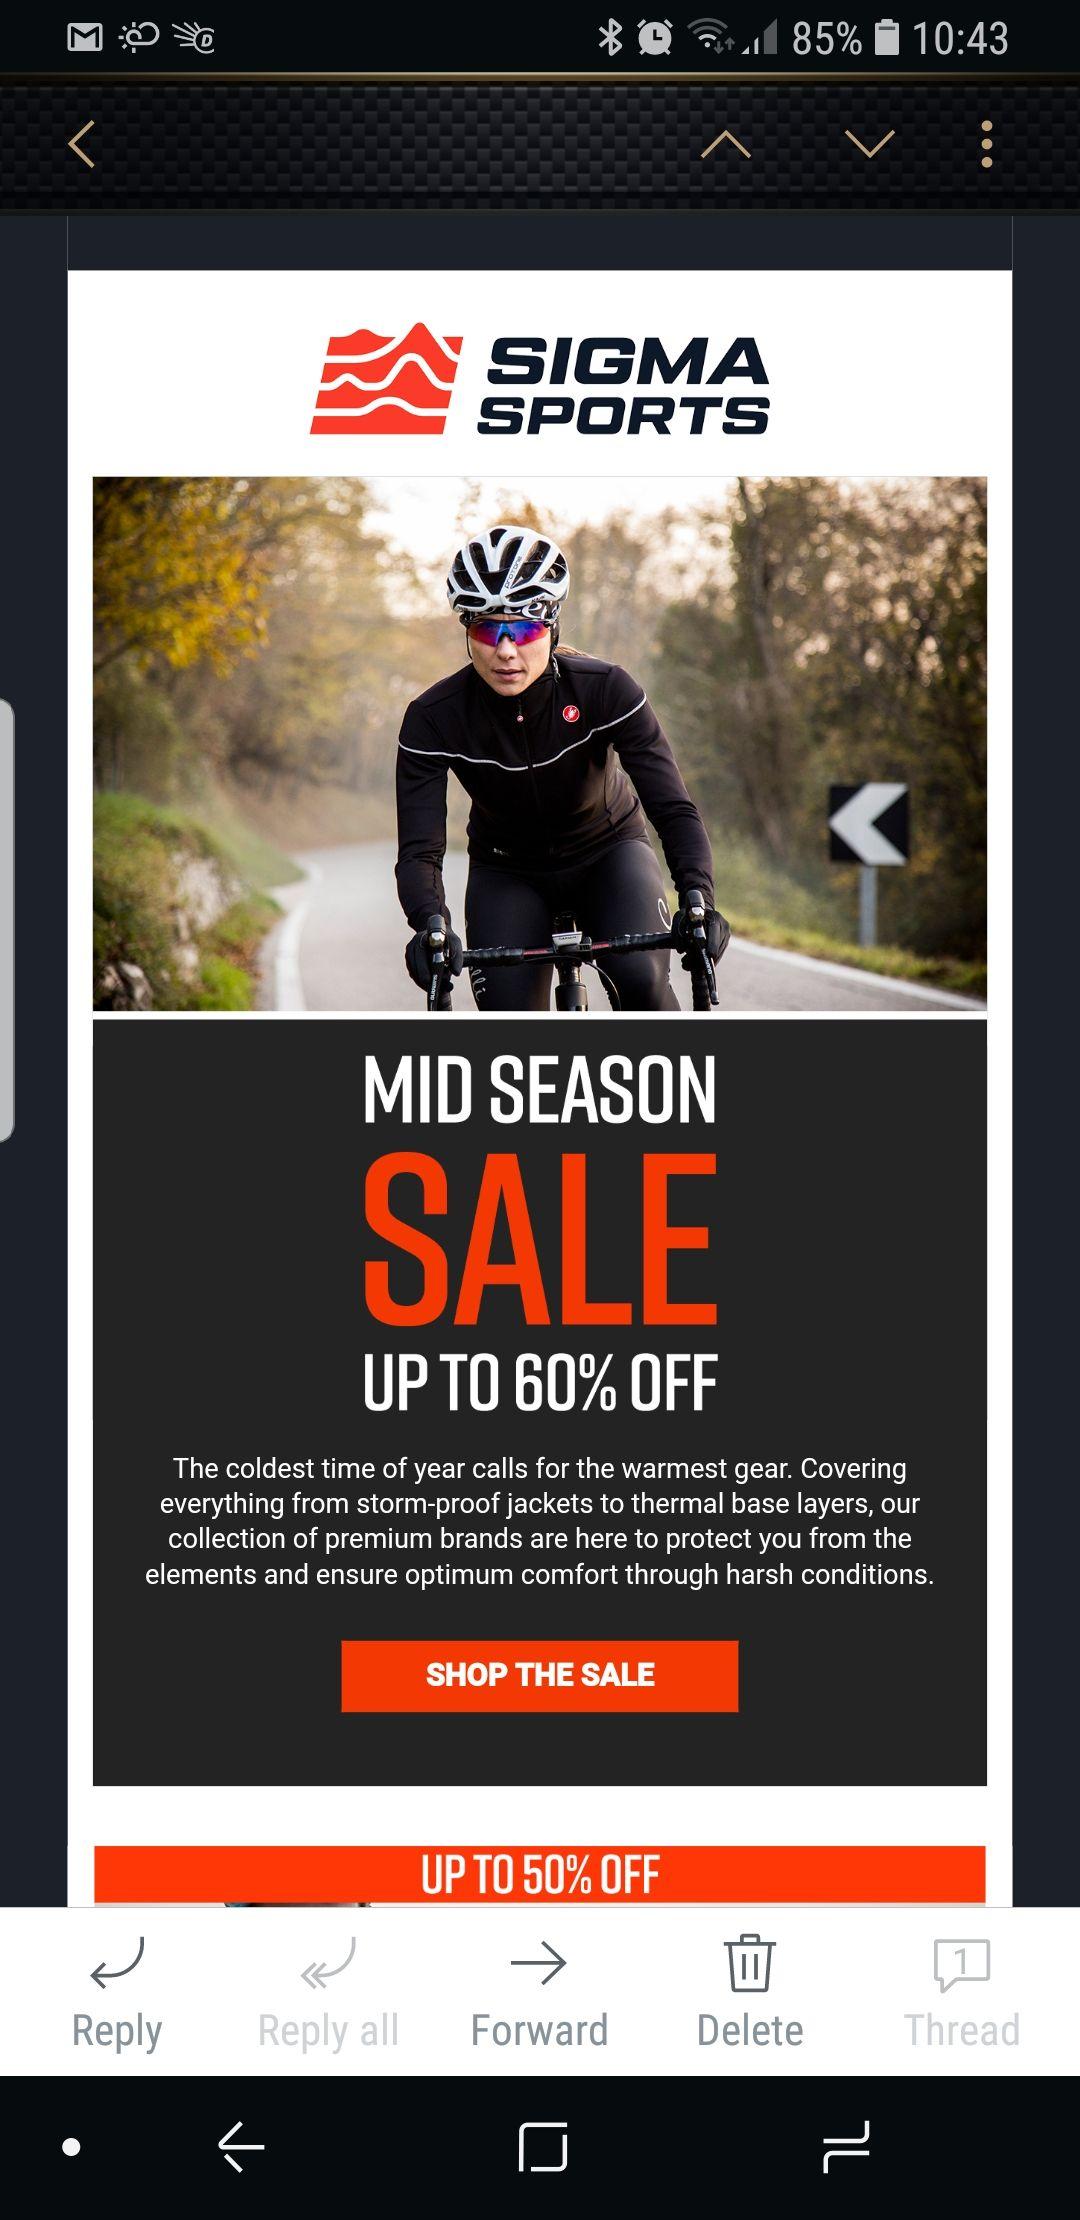 Upto 60% off Cycling brands incl Castelli, Sportful, Black Sheep, Ashme, Ale & Mavic Mid Season Sale at Sigma Sports